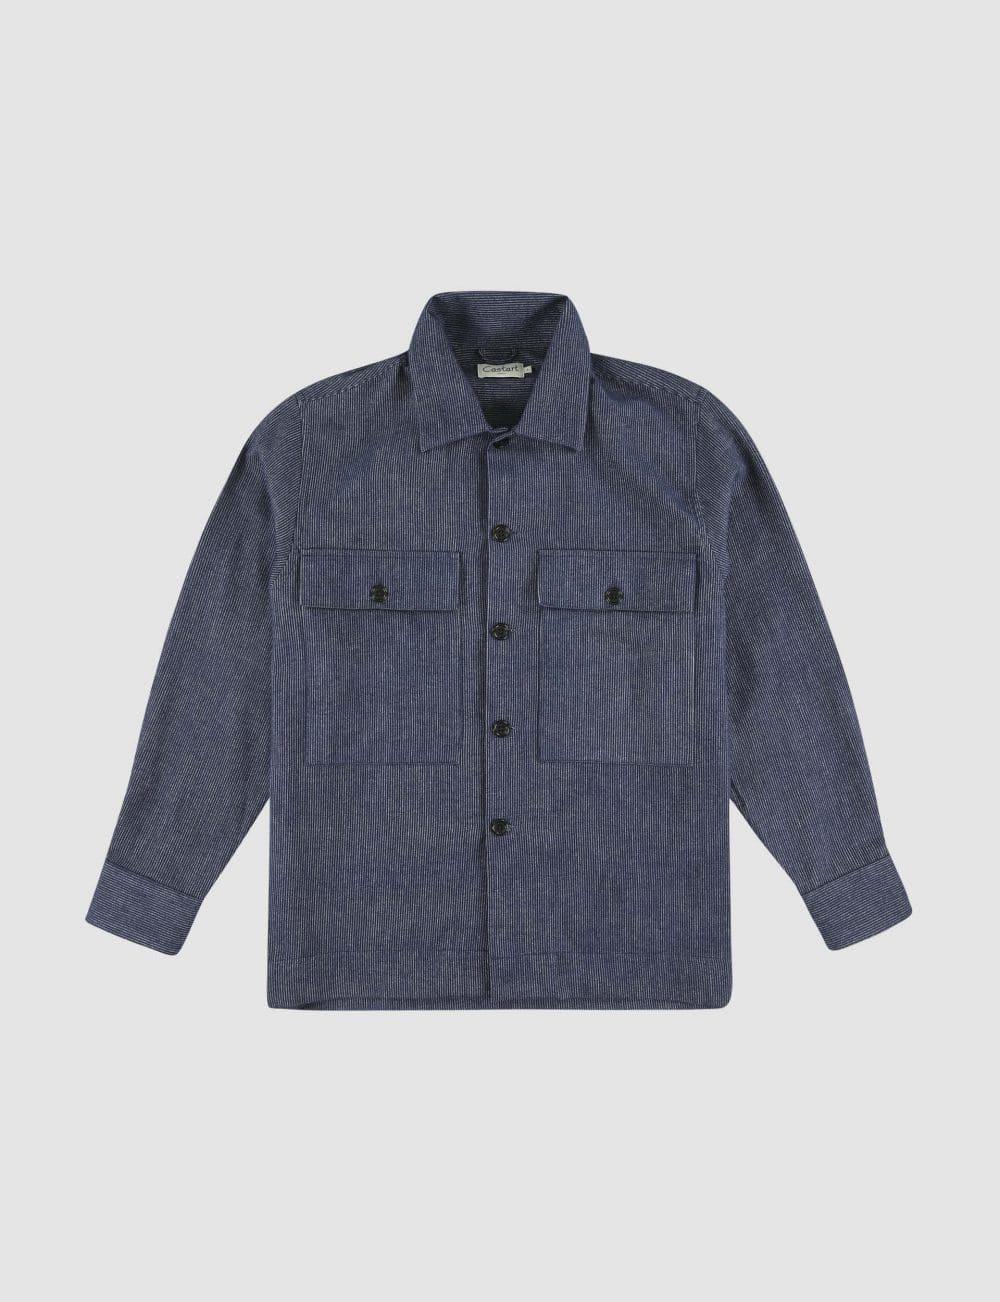 Ensor - Navy Blue